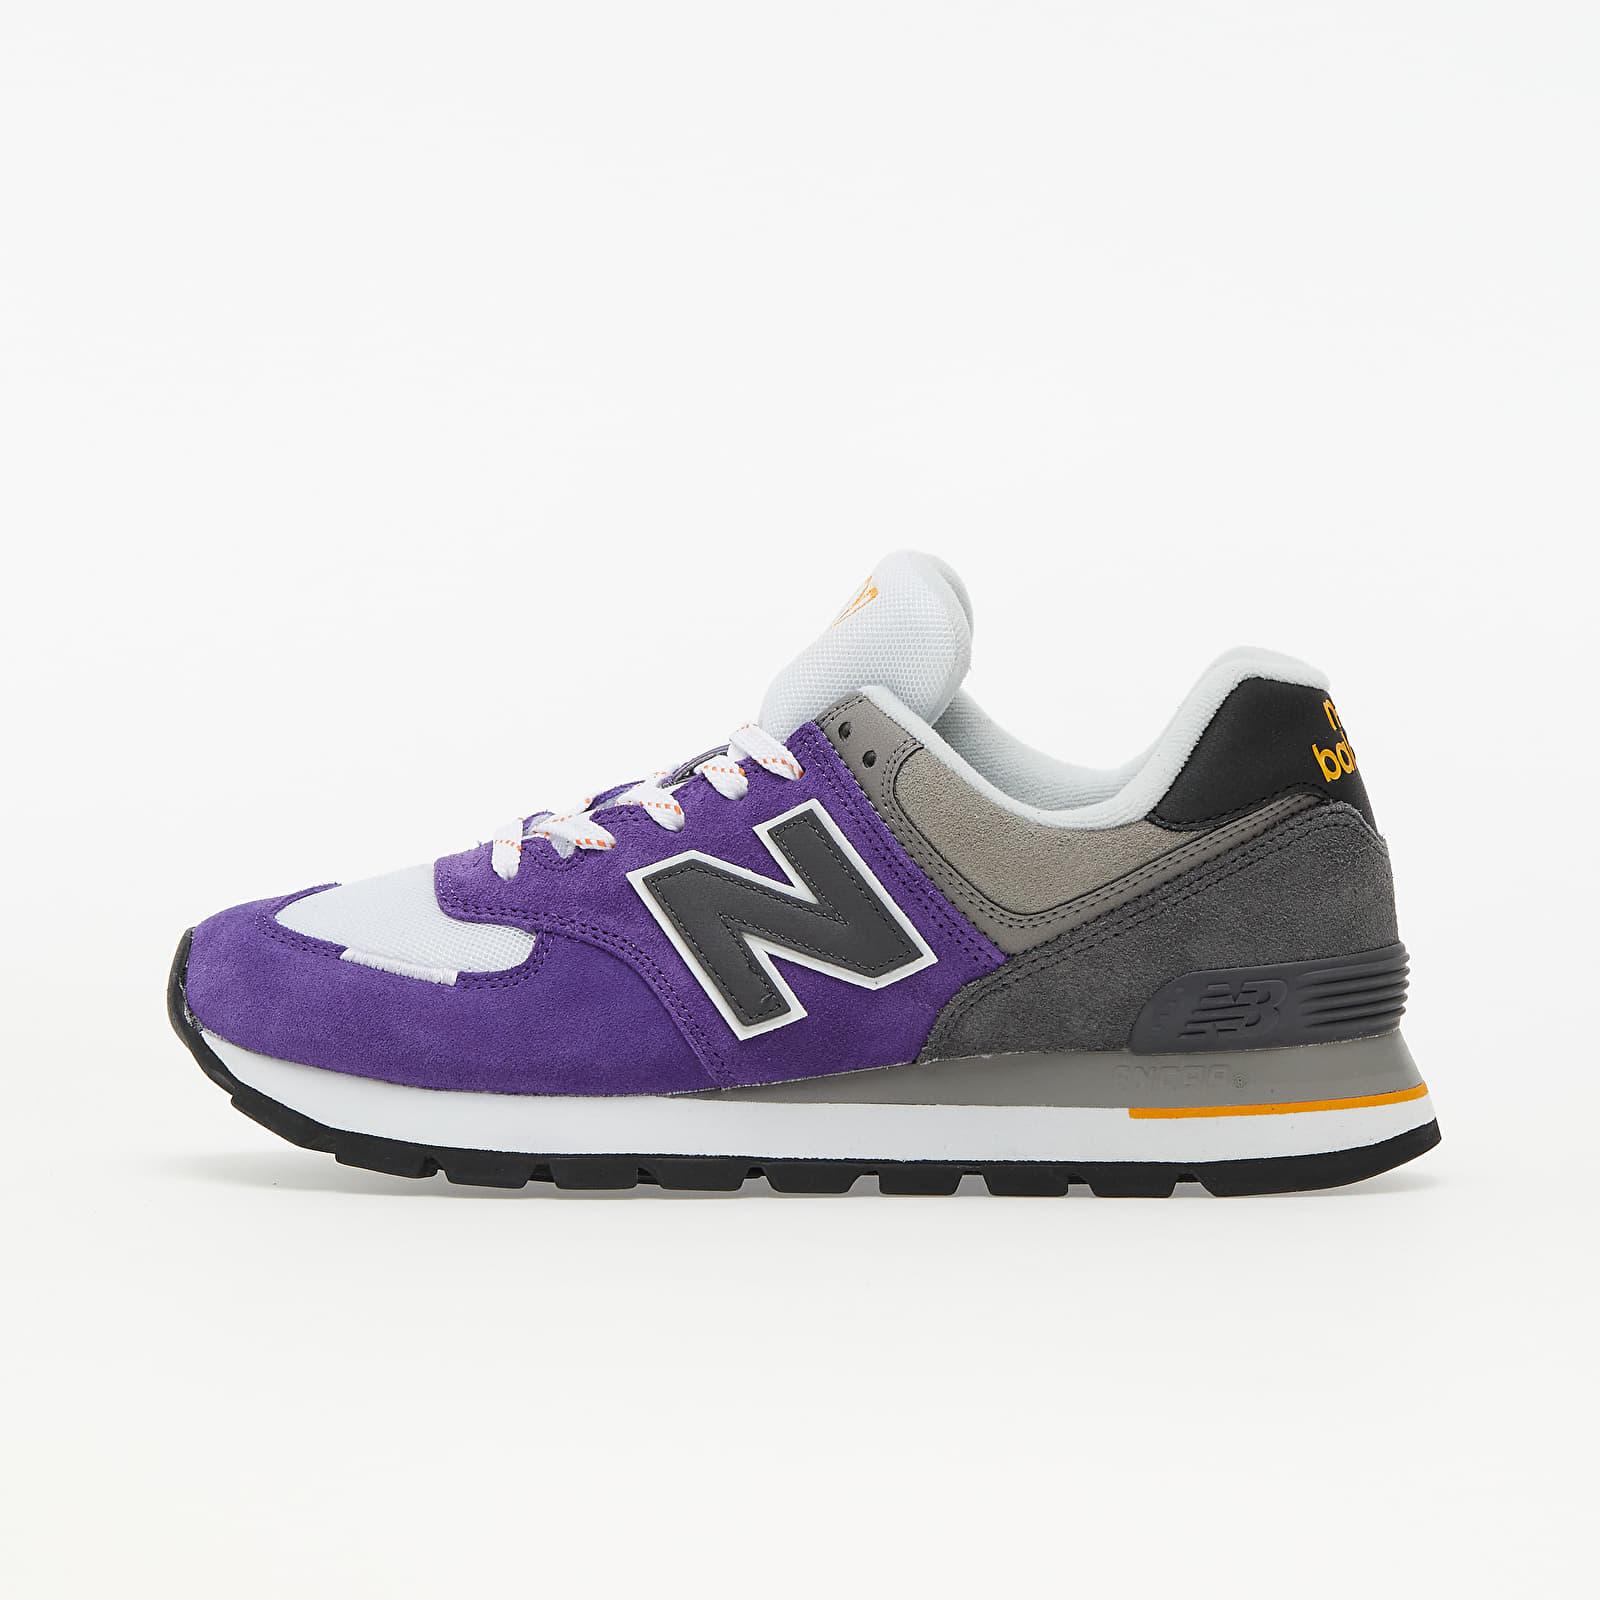 New Balance 574 Purple/ Grey EUR 44